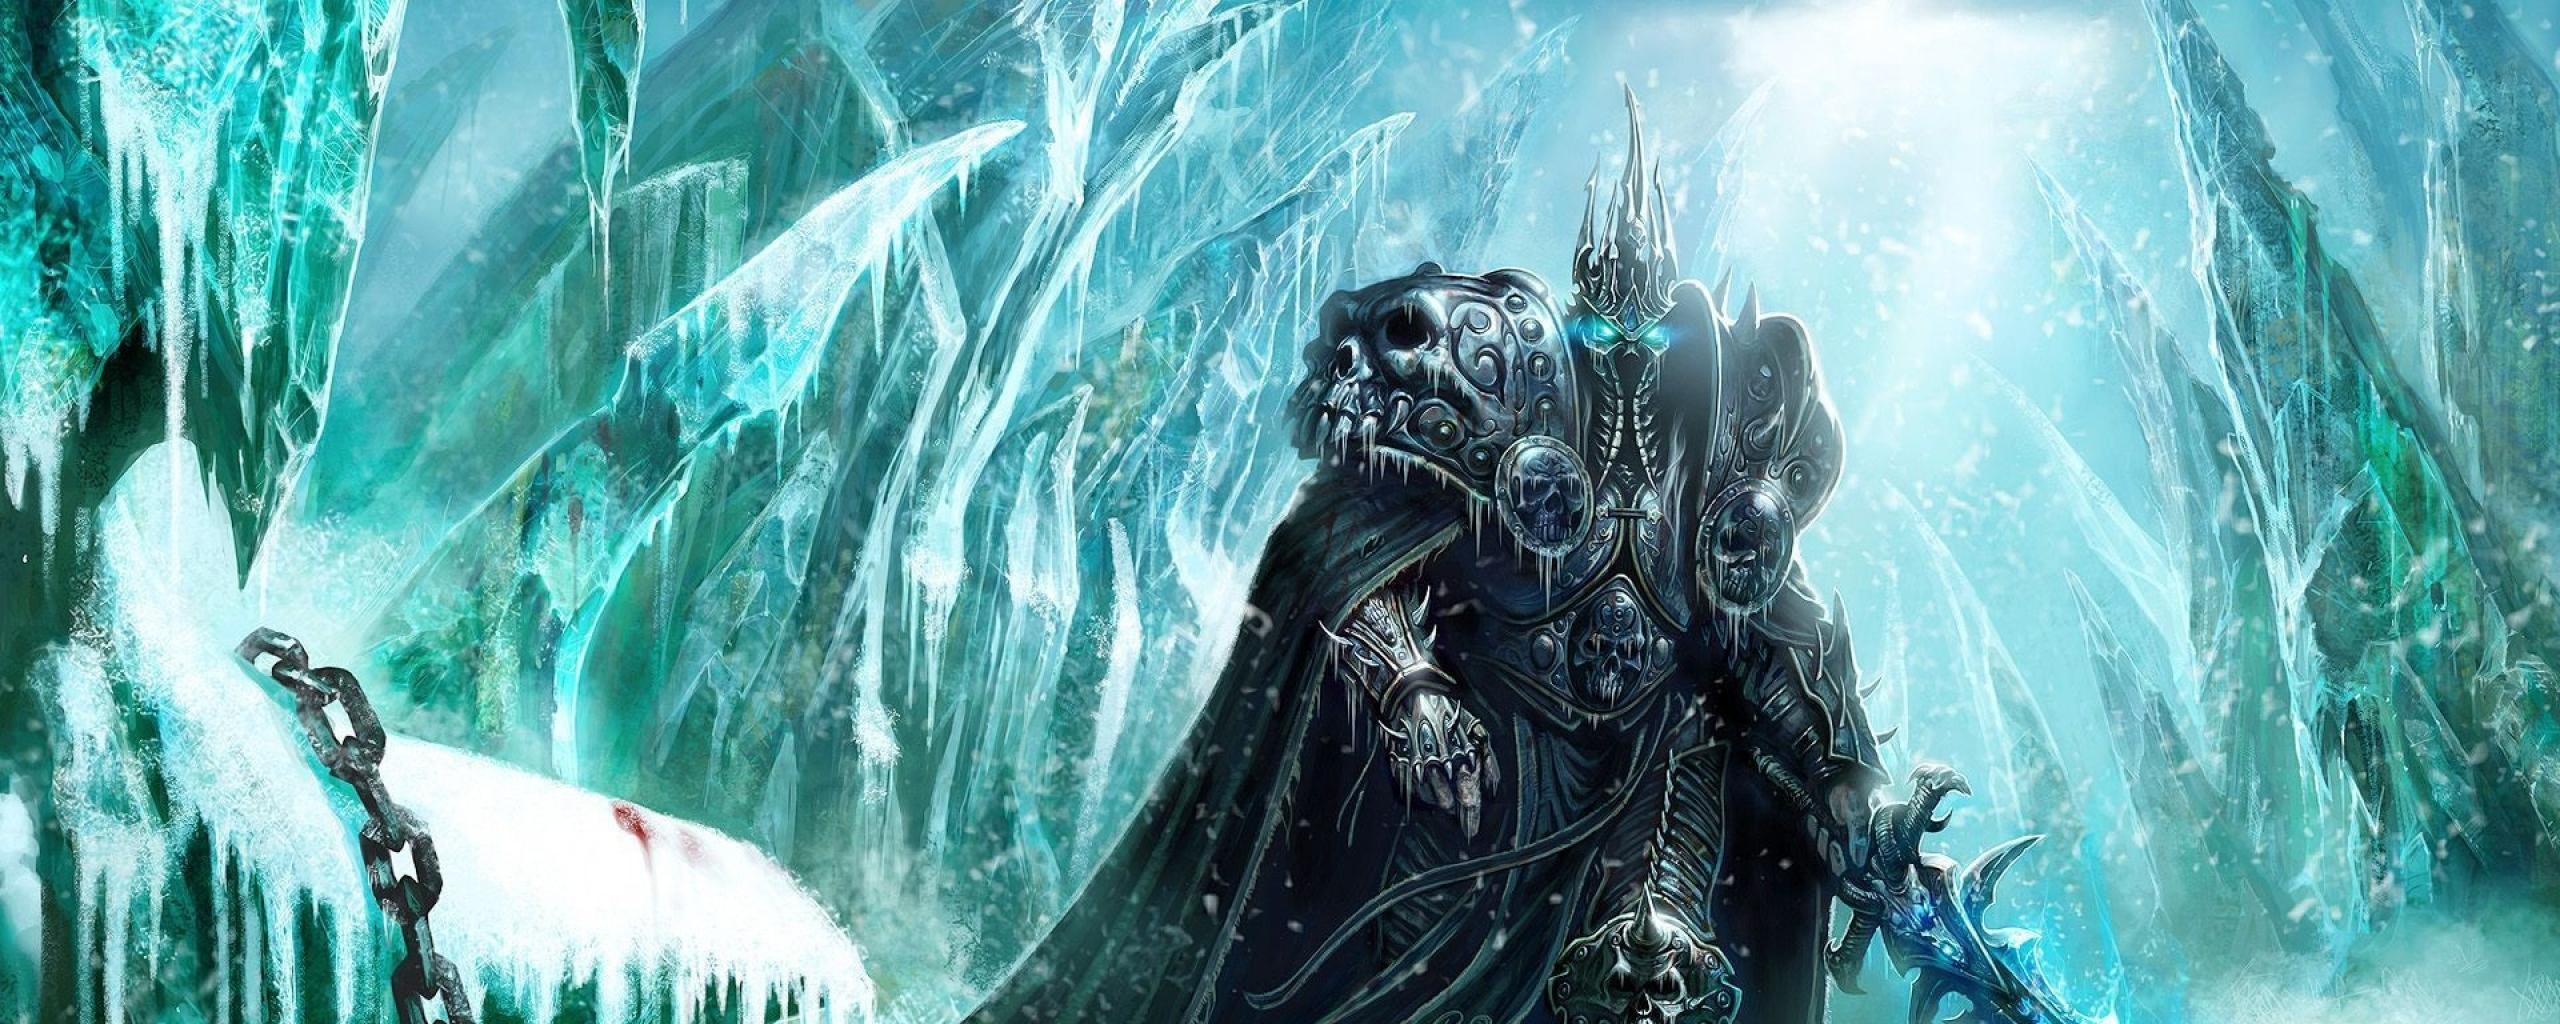 World Of Warcraft Dual Monitor Wallpaper Sf Wallpaper